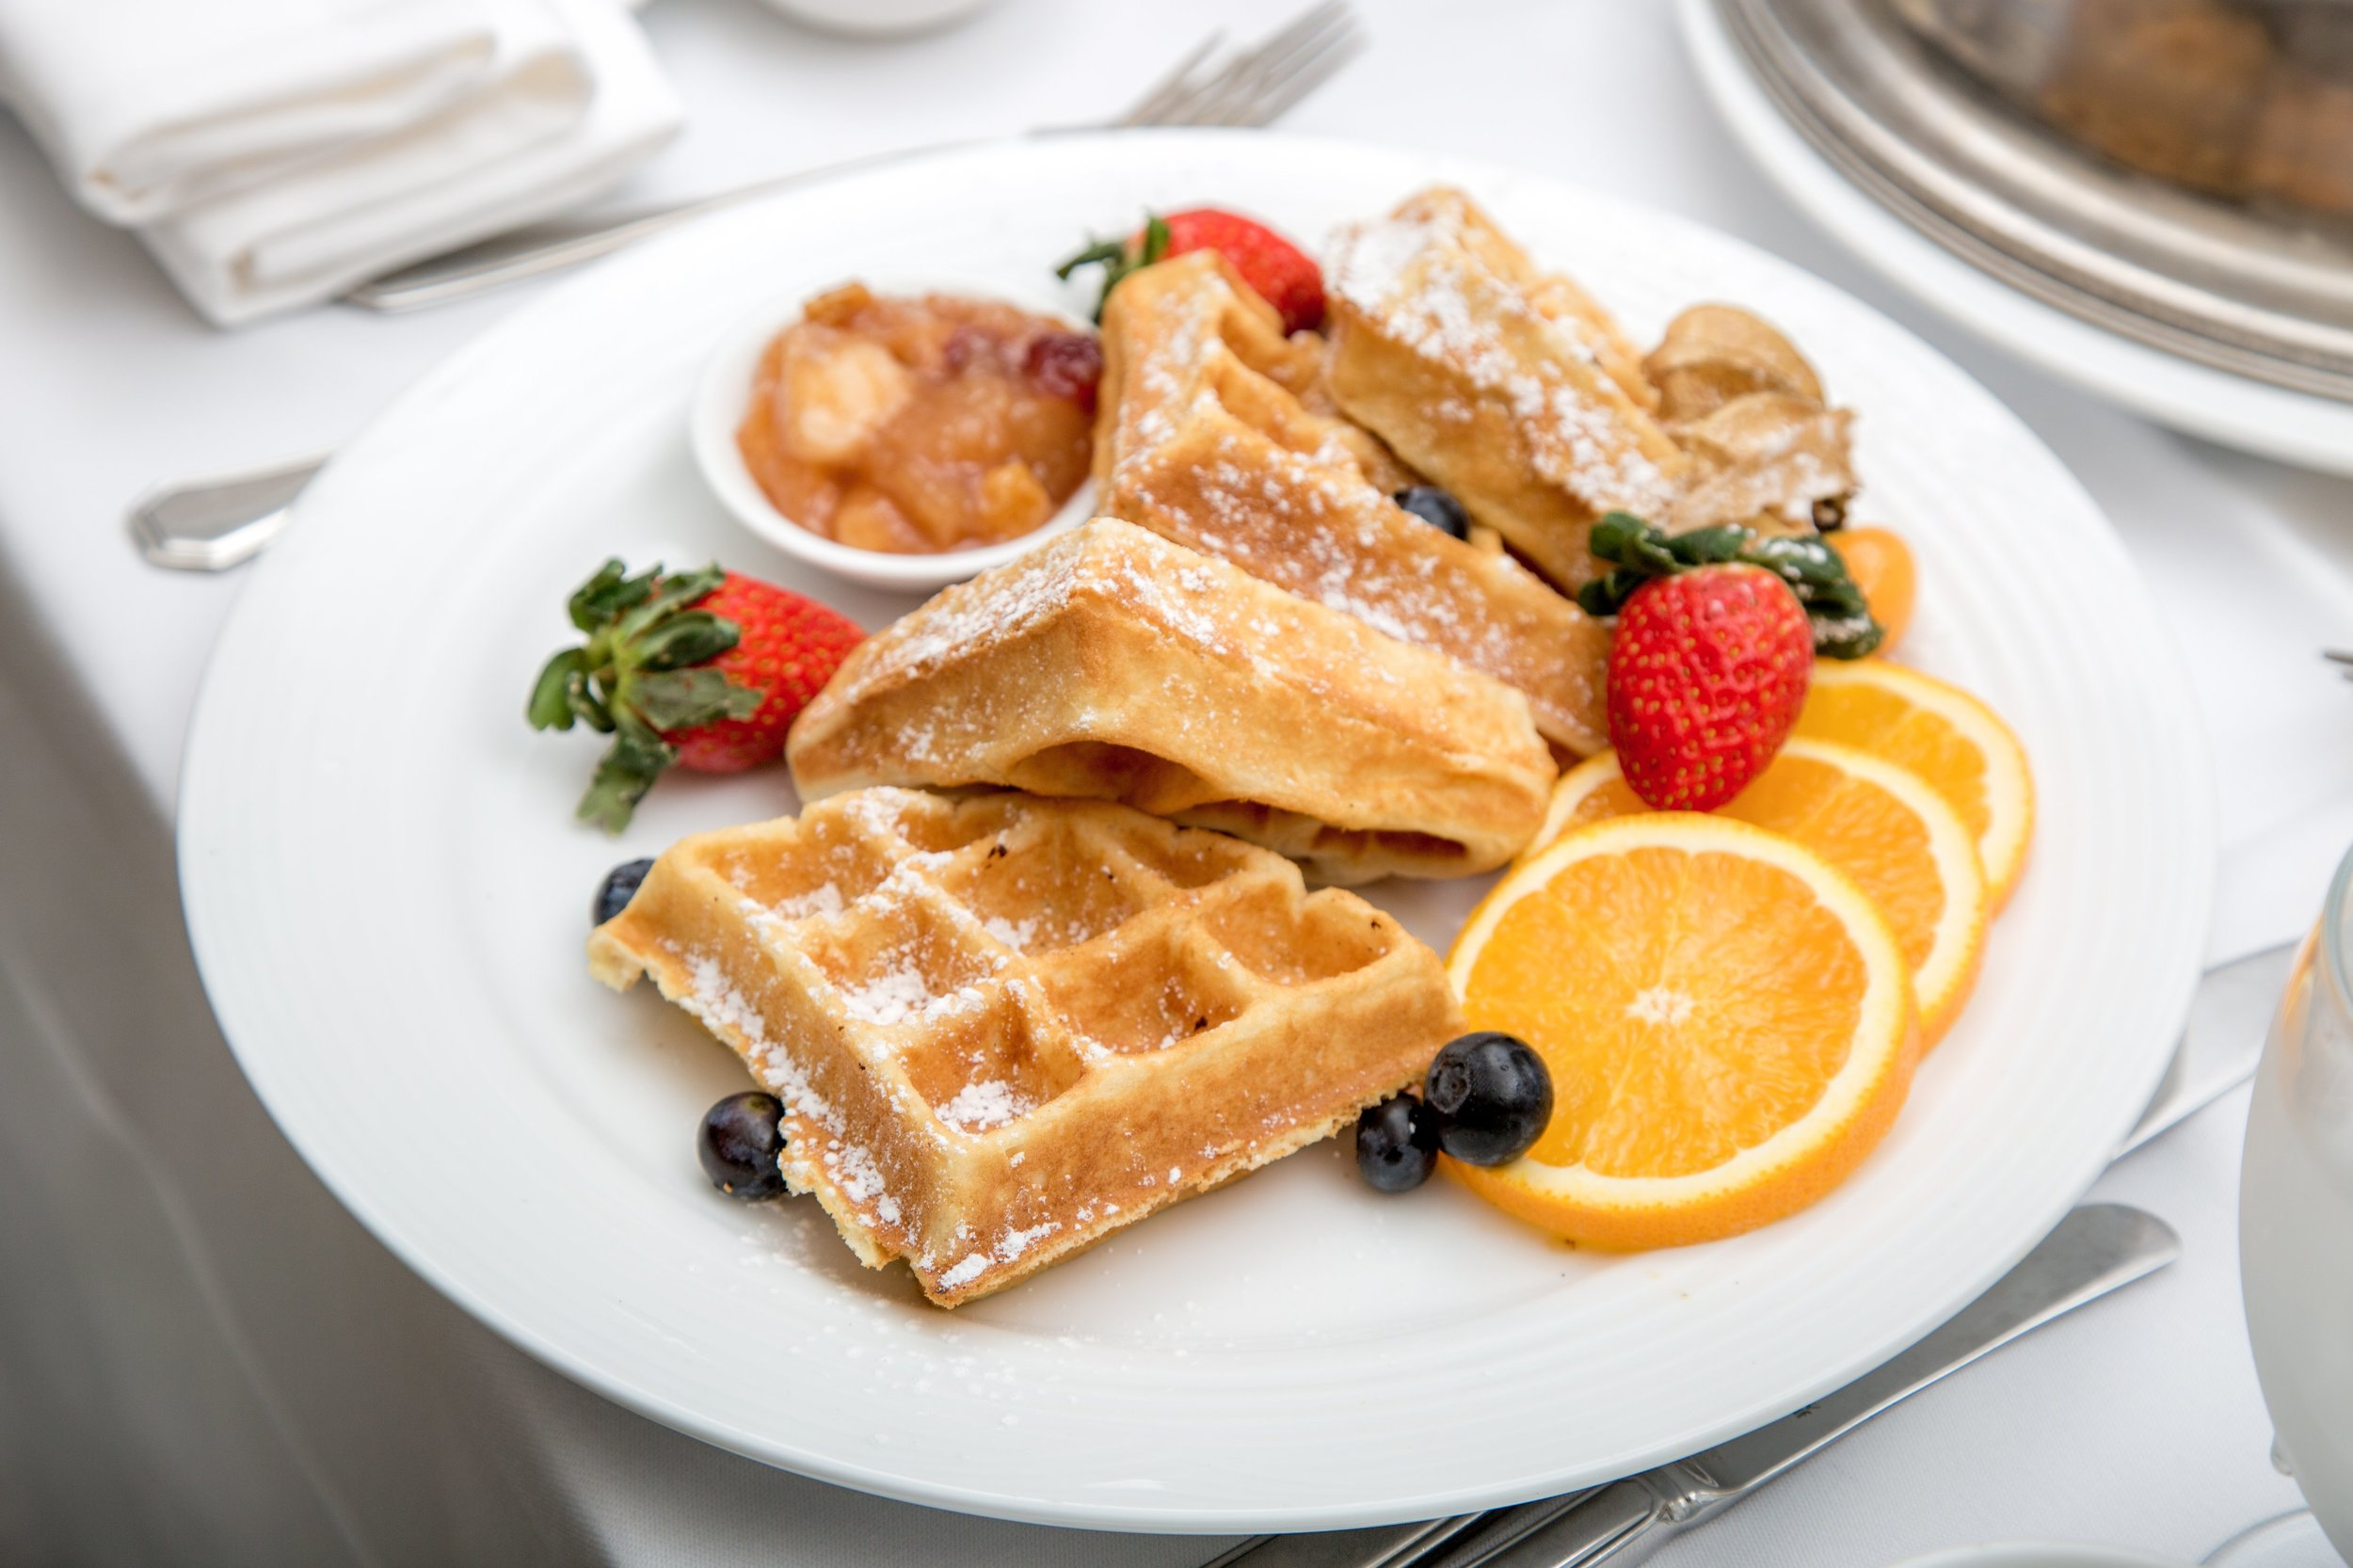 waffles-and-fruit-breakfast_4460x4460.jpg